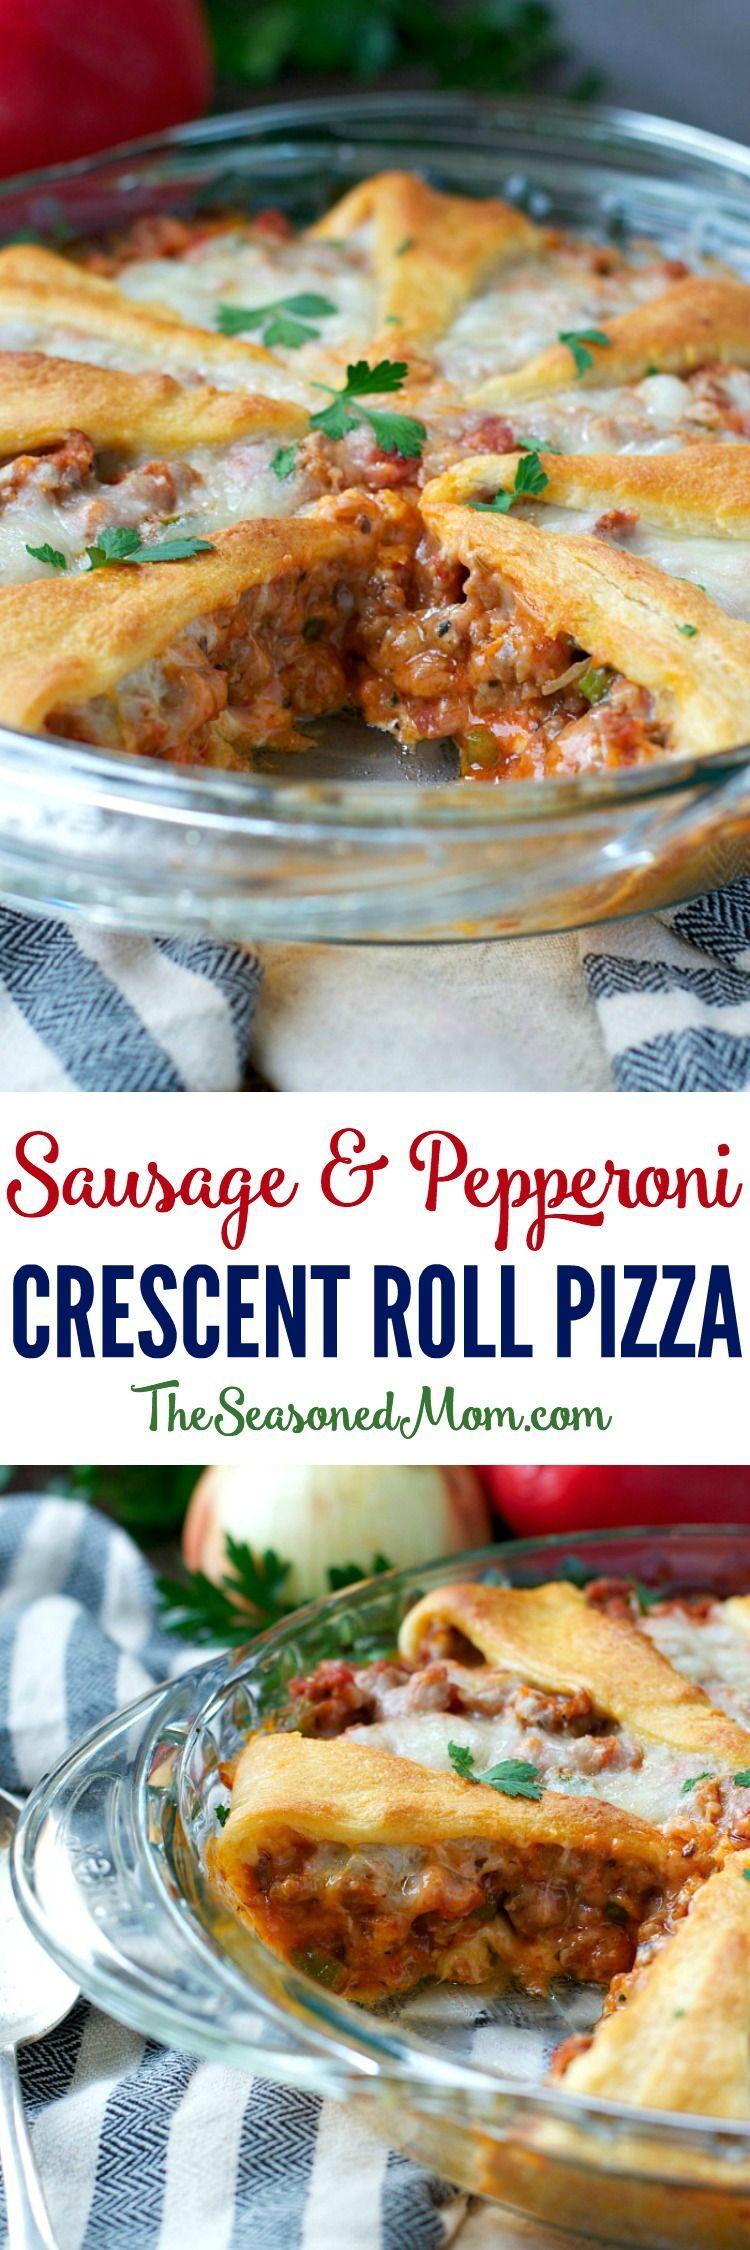 Sausage and Pepperoni Crescent Roll Pizza Recipe